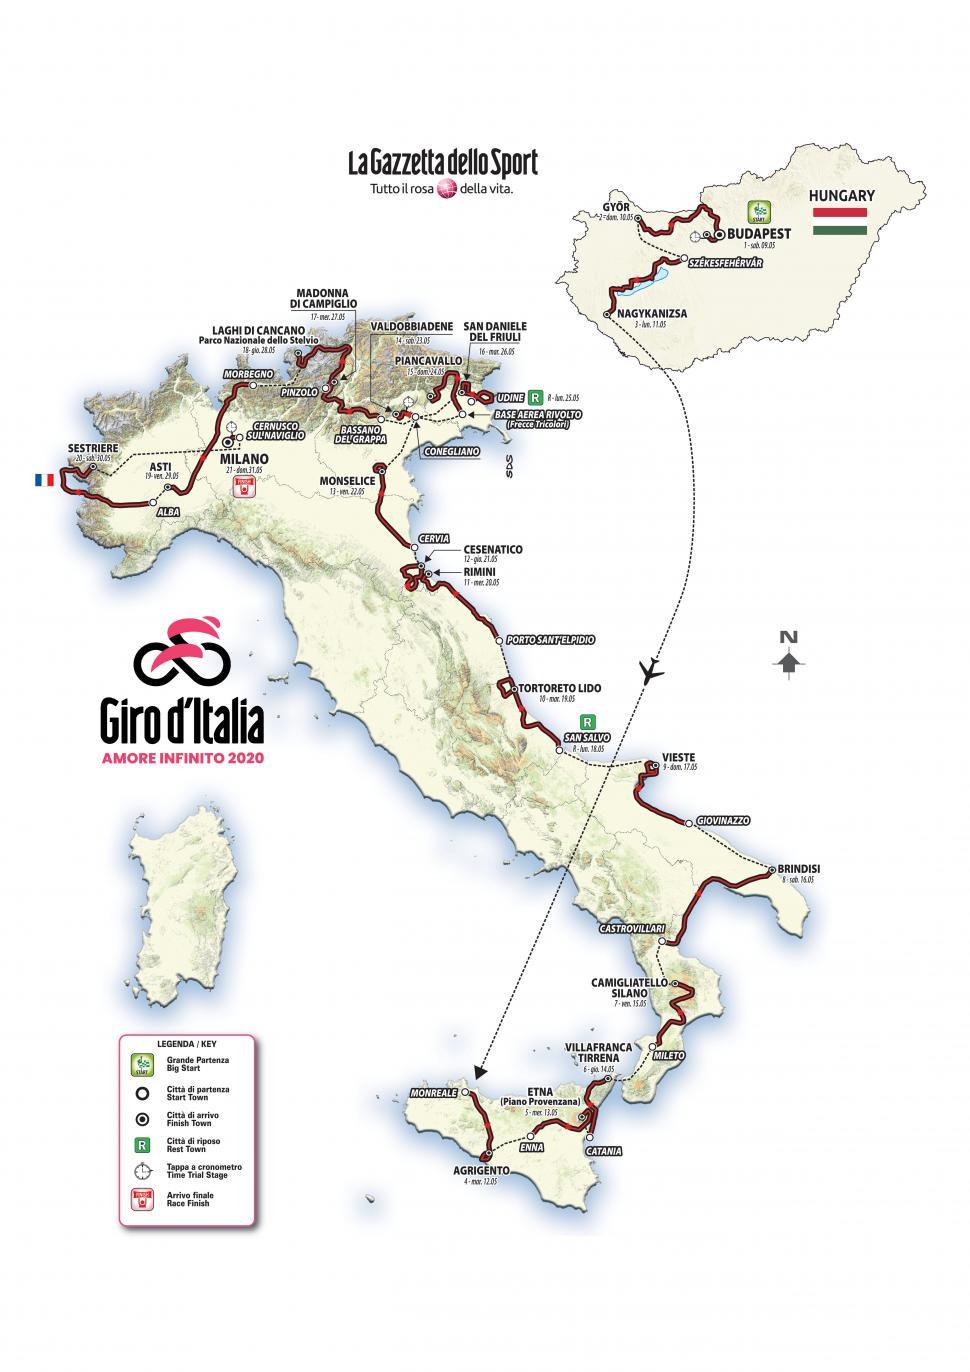 Giro d'Italia 2020 route map